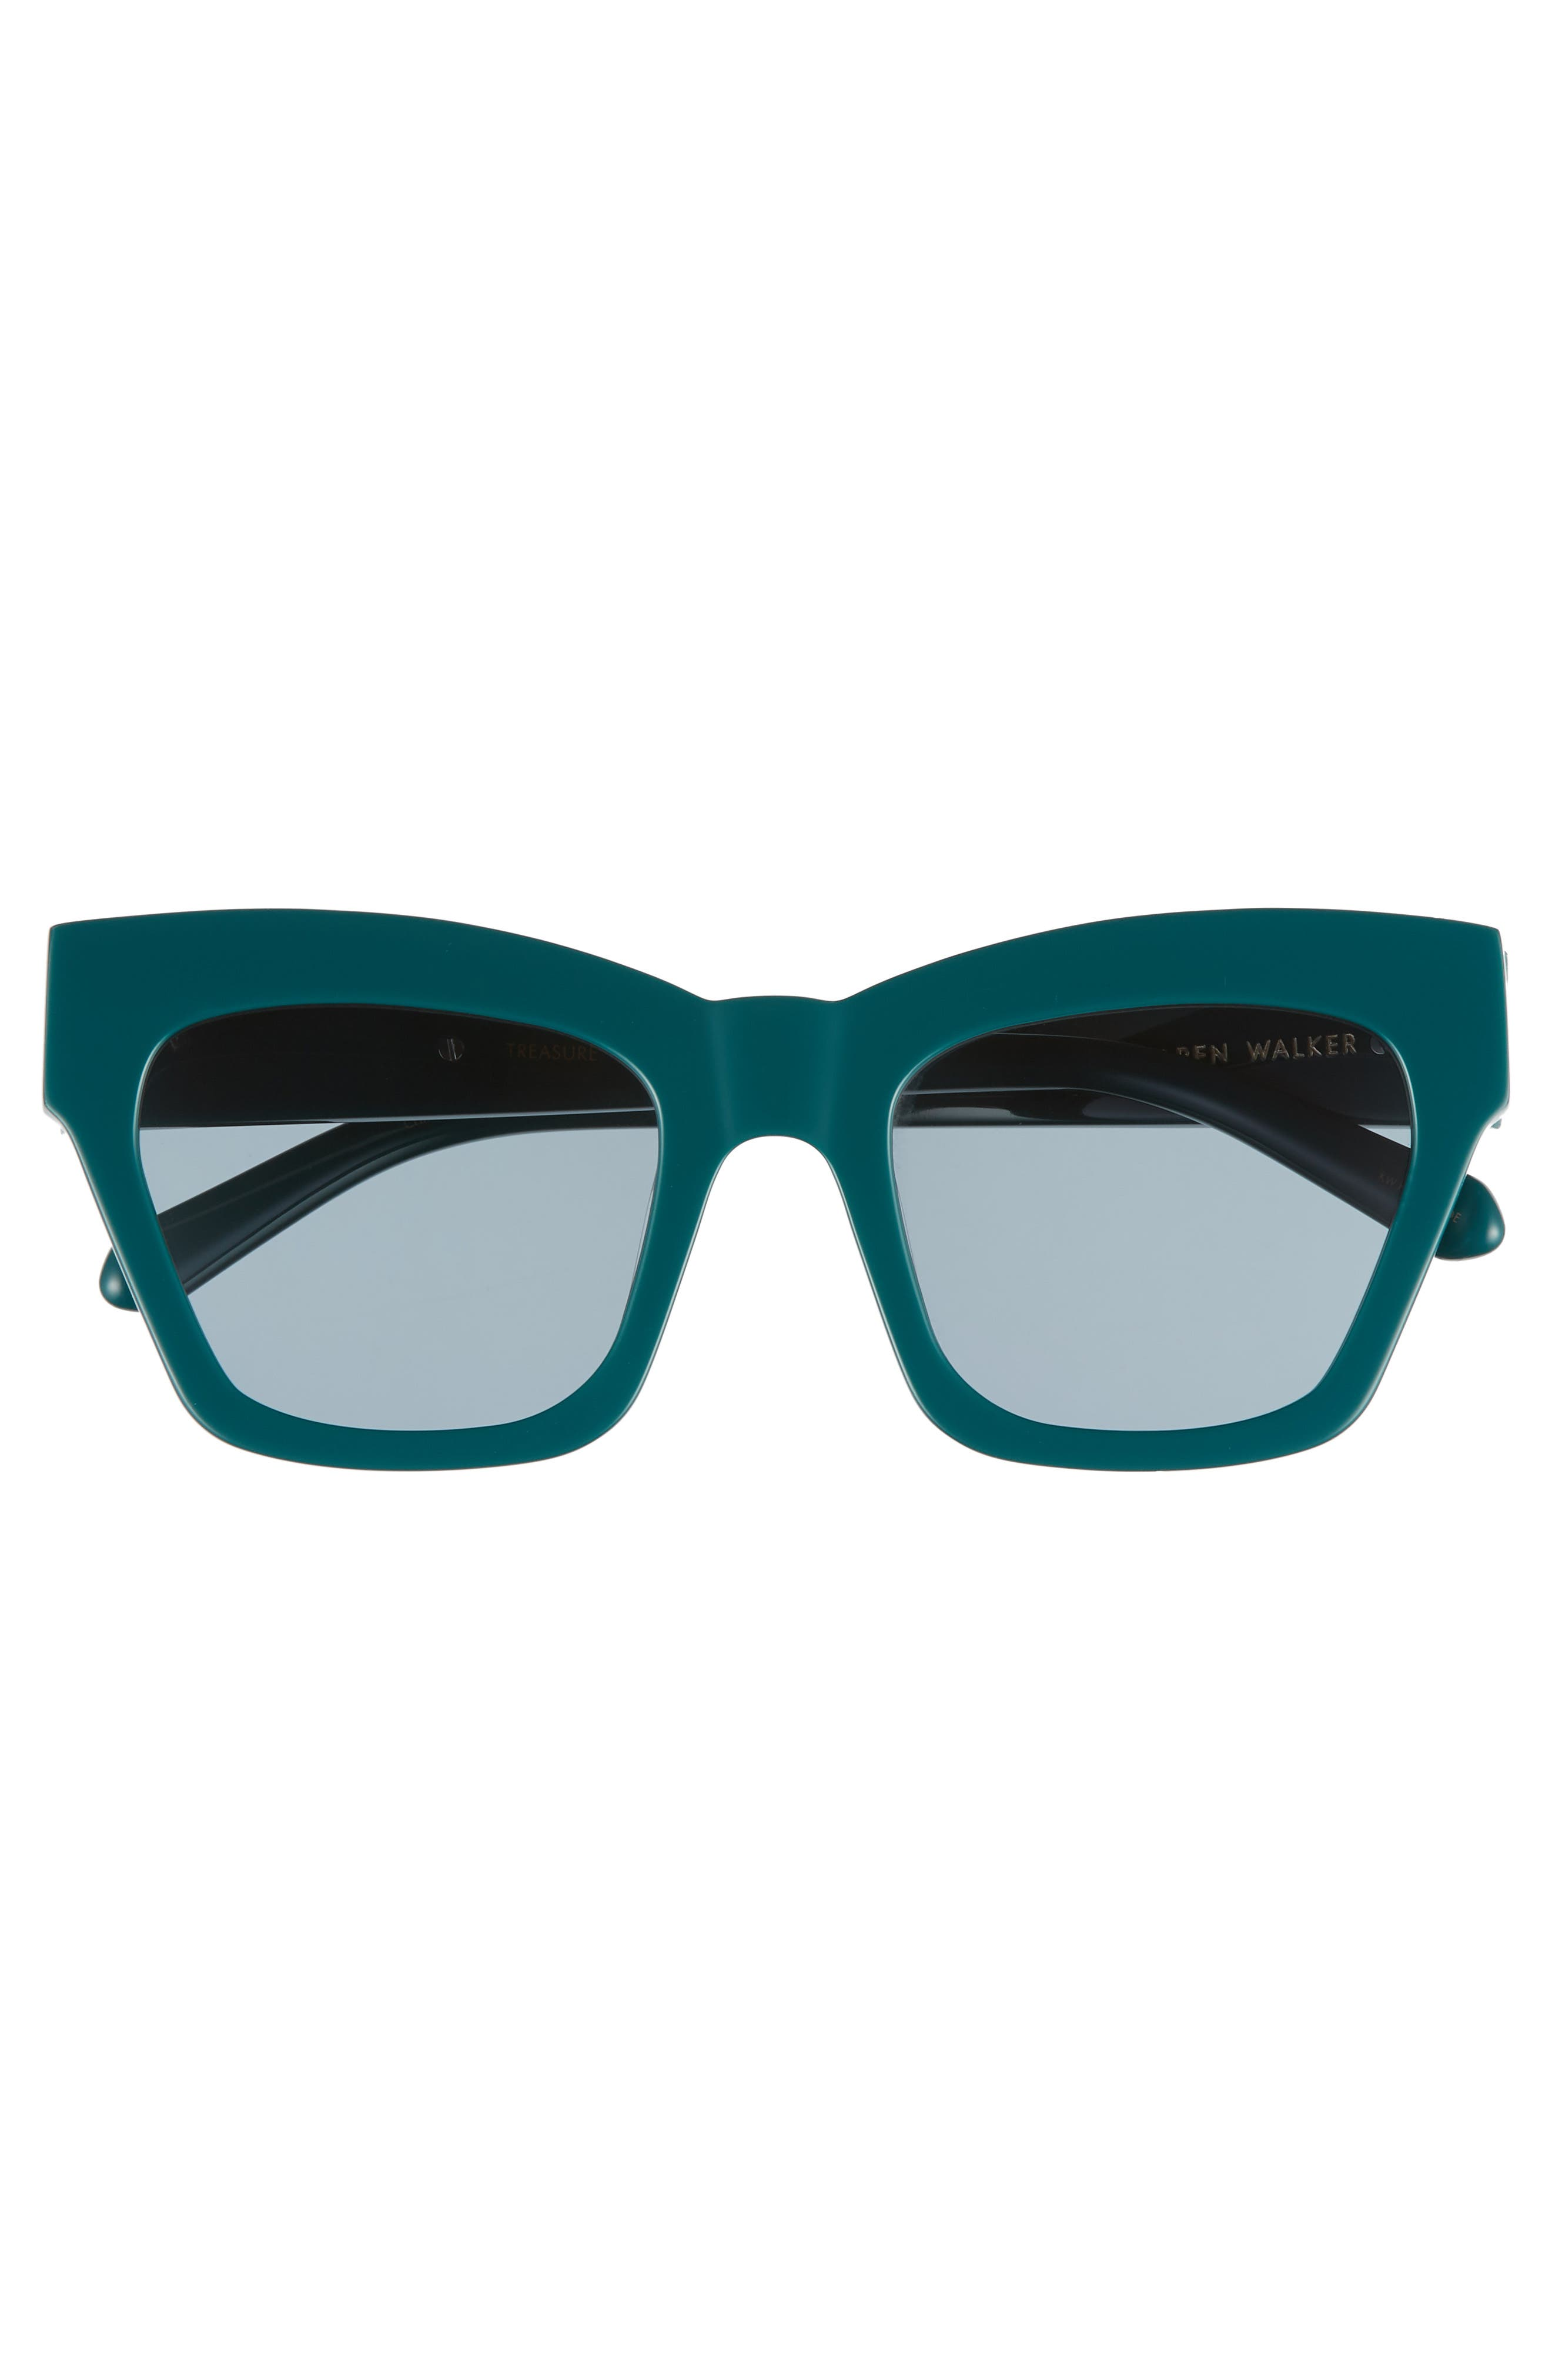 Treasure 52mm Cat Eye Sunglasses,                             Alternate thumbnail 3, color,                             EMERALD/ EMERALD